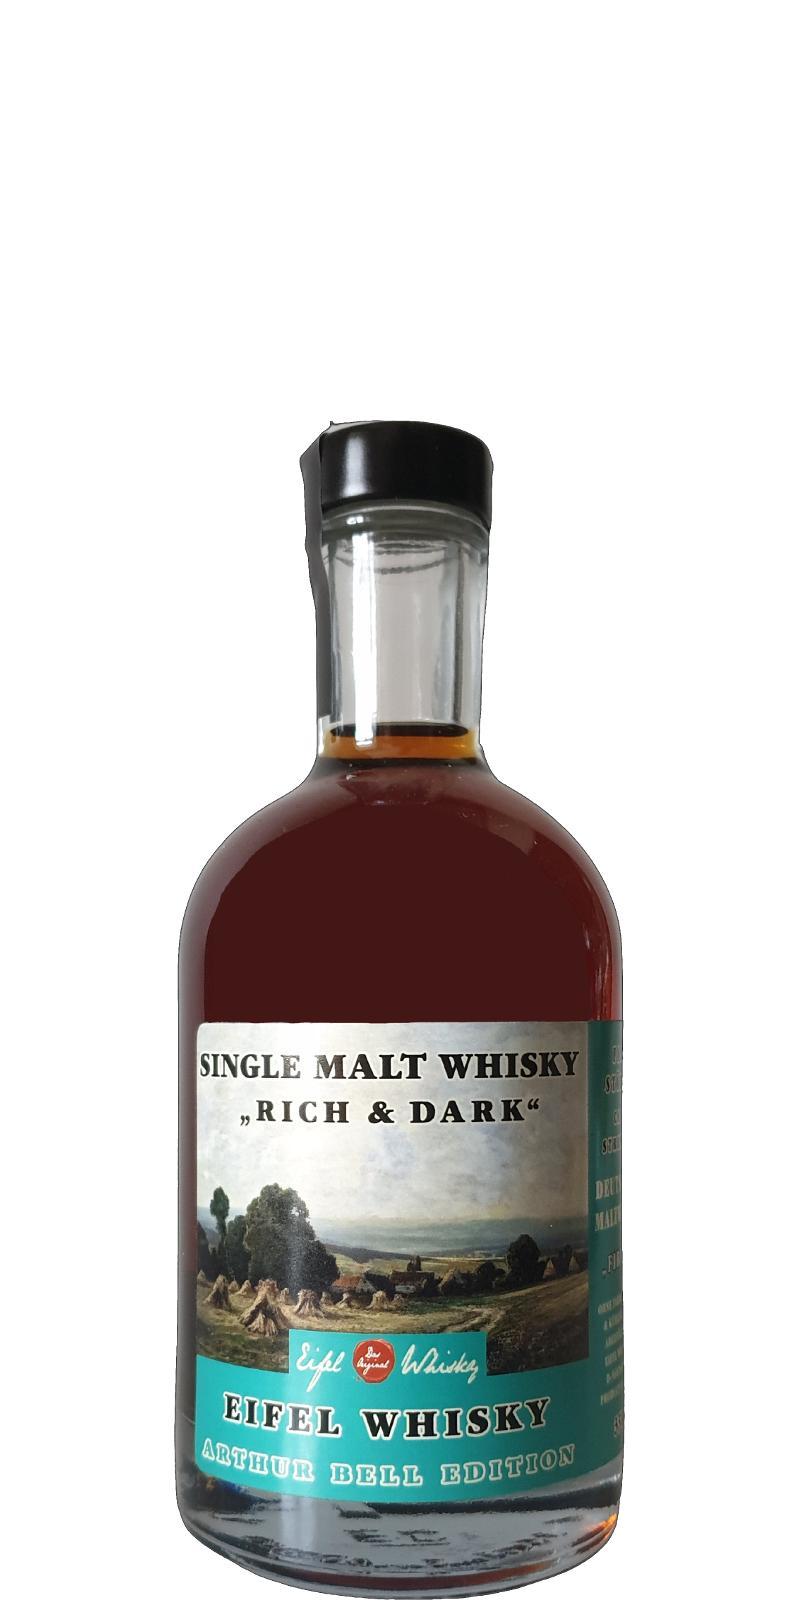 "Eifel Whisky Single Malt Whisky ""Rich & Dark"""